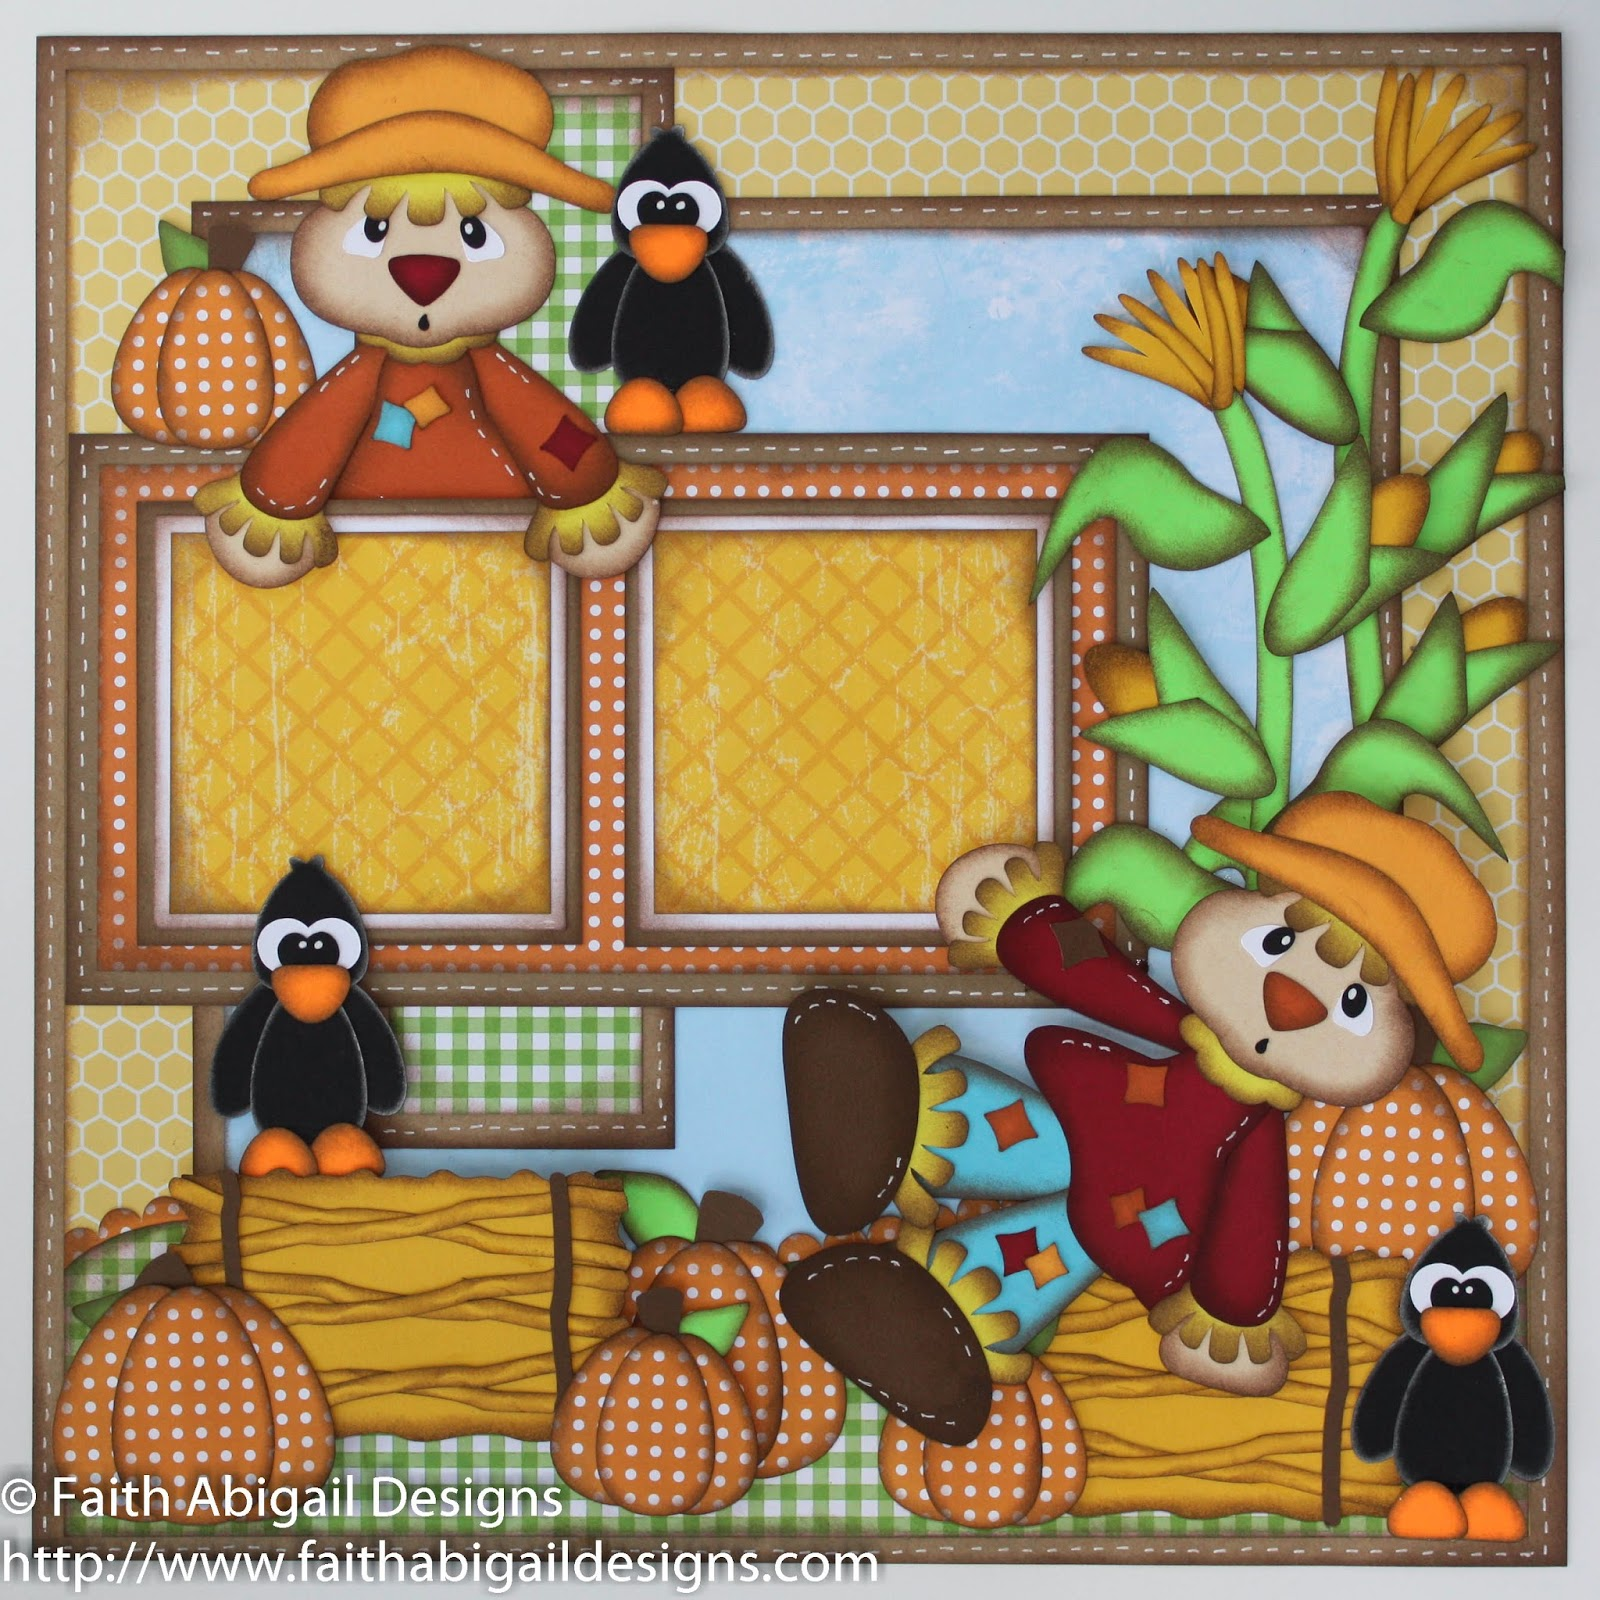 Scrapbook ideas about friends - Scarecrow Friends 12 X12 Single Page Scrapbook Layout